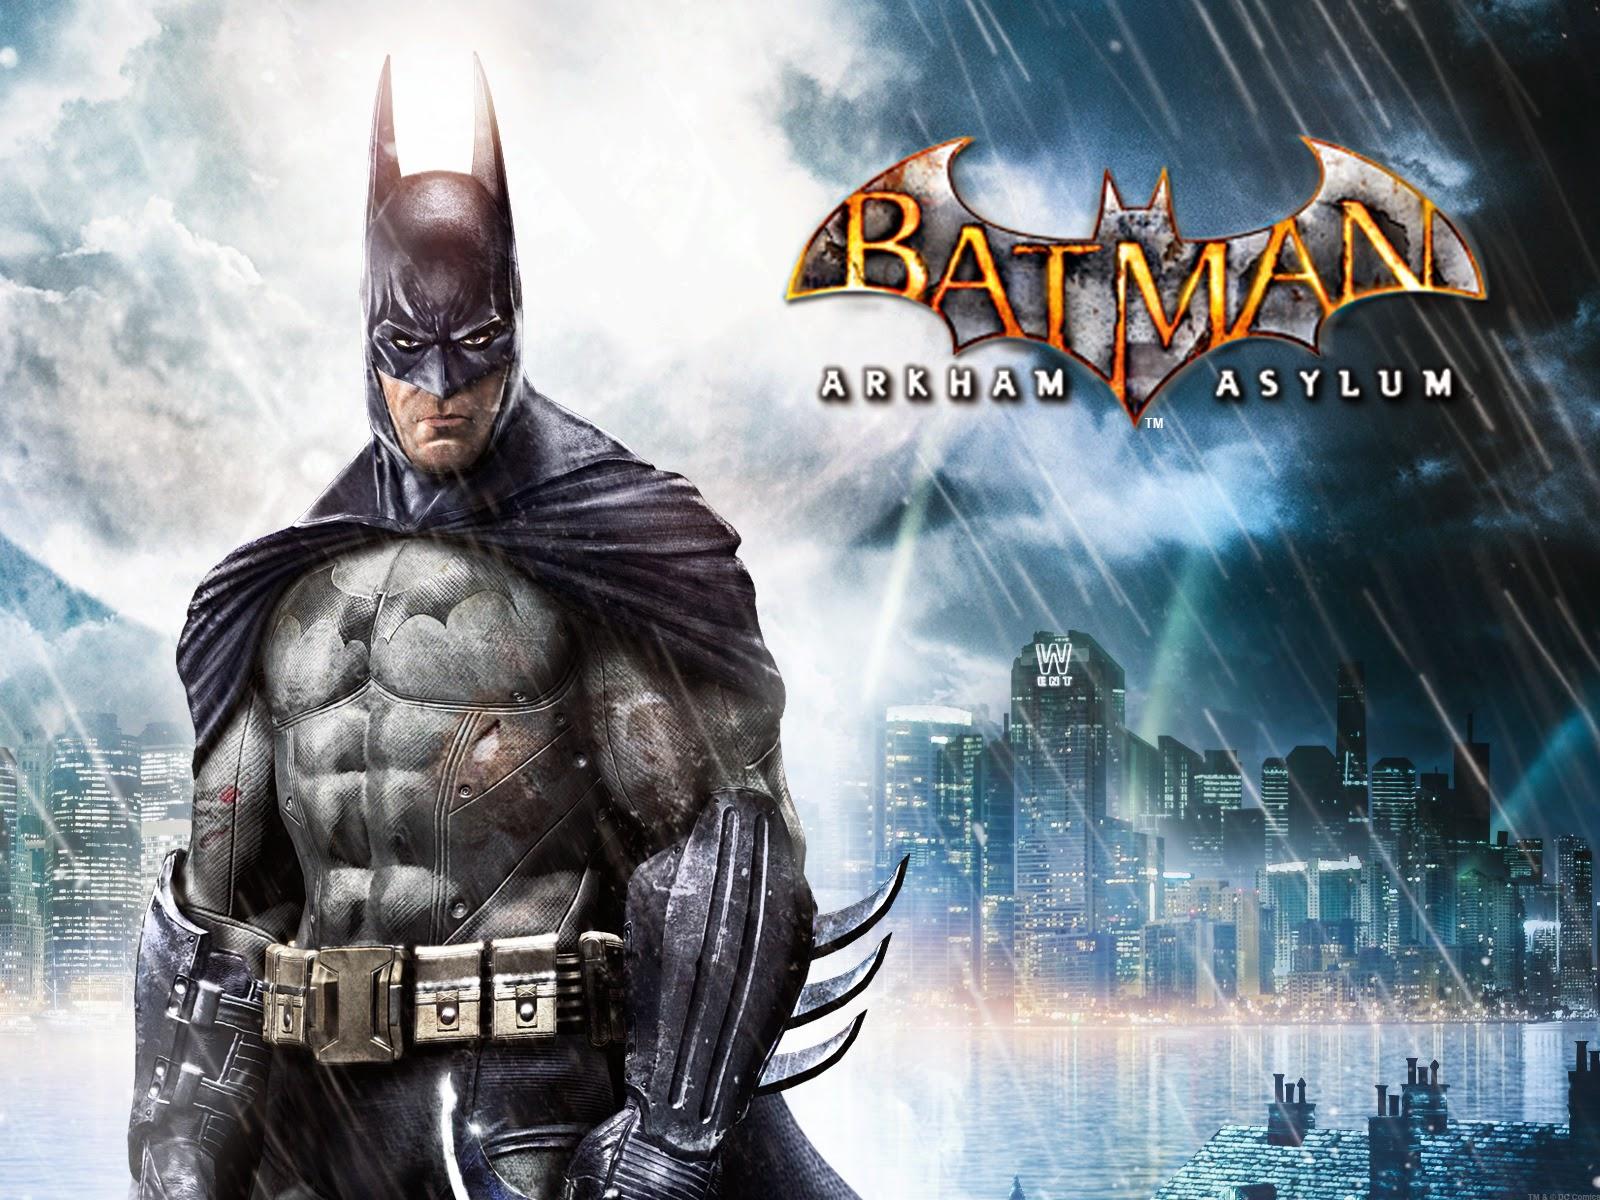 Batman: Arkham Asylum Game of the Year Edition (FULL DLC) free download